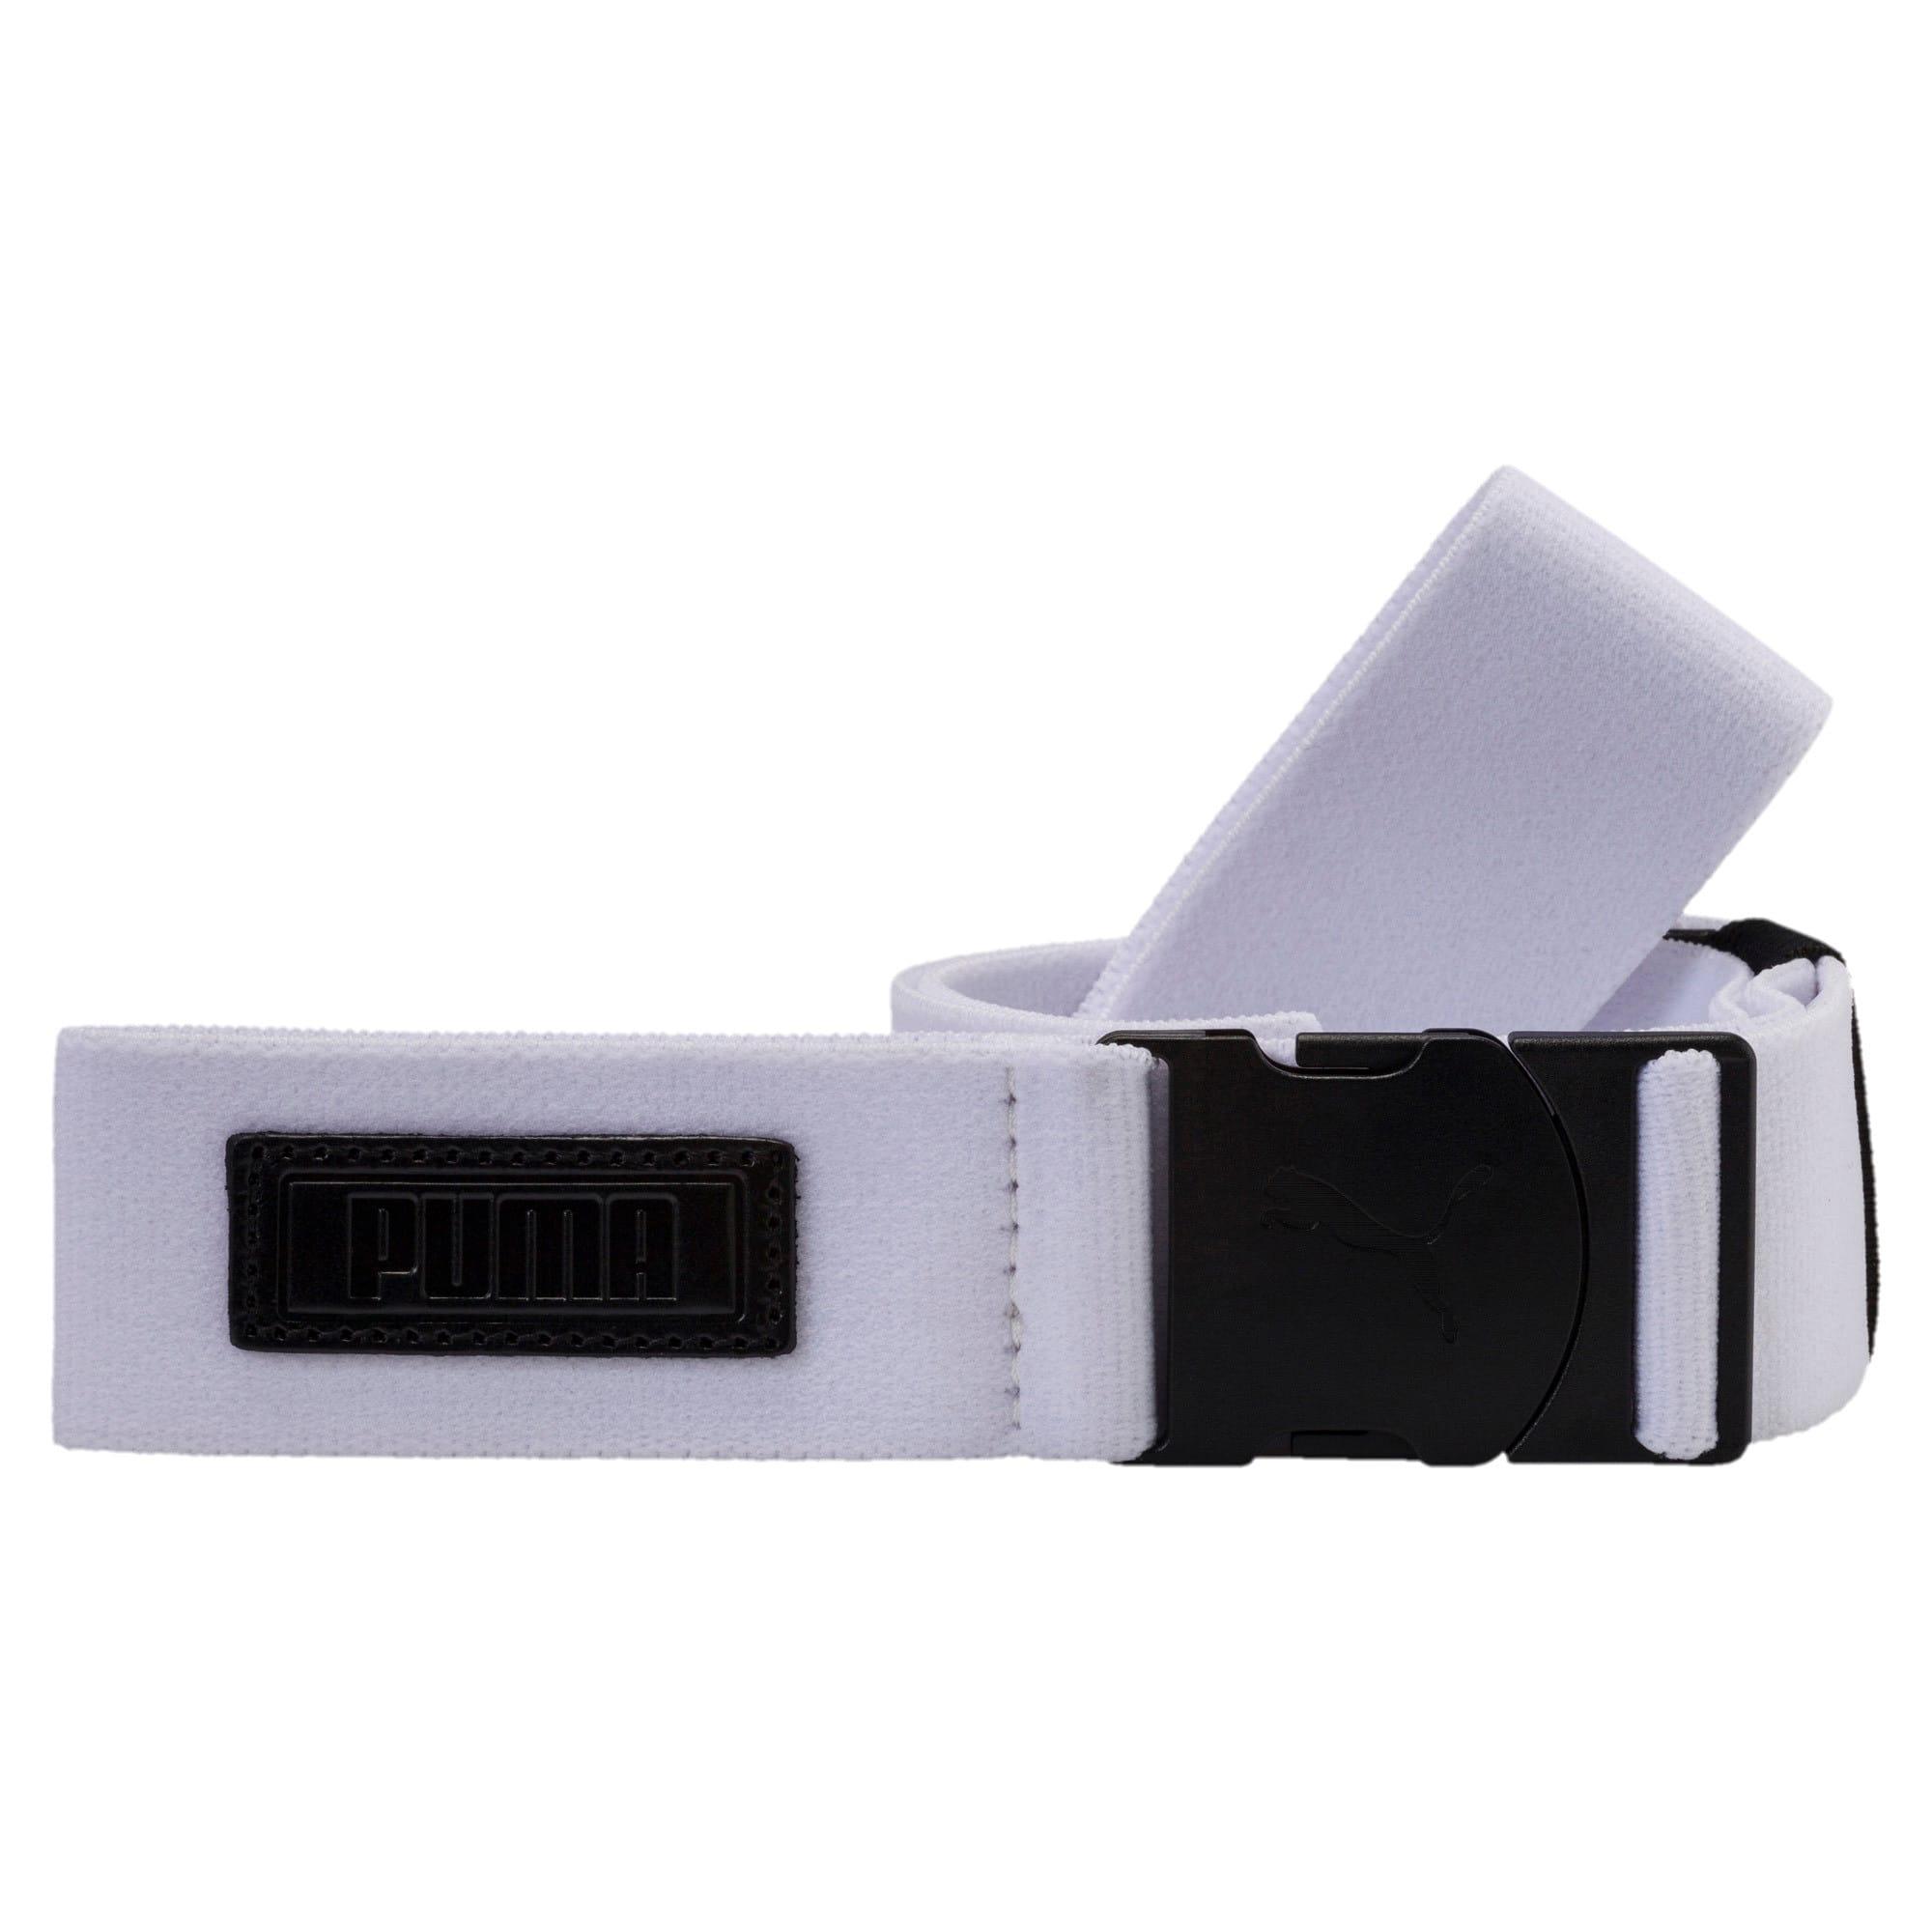 Thumbnail 1 of Ultralite Stretch Belt, Bright White, medium